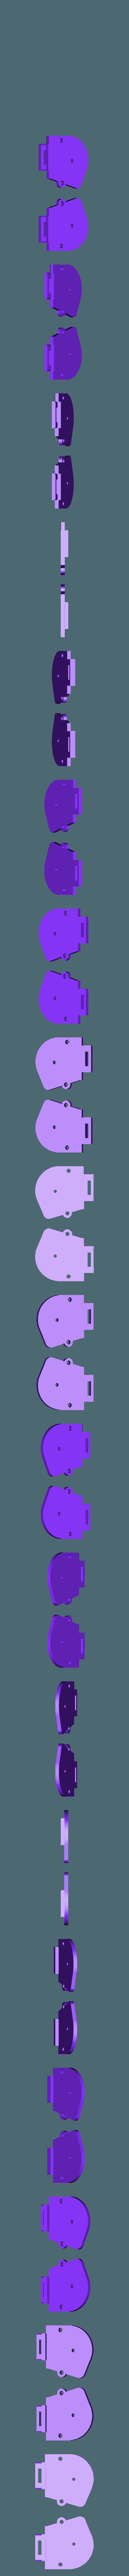 20x20_micro_swift_1.stl Download free STL file 20x20 Runcam Swift micro VTX03 Pod • 3D printer model, Domi1988